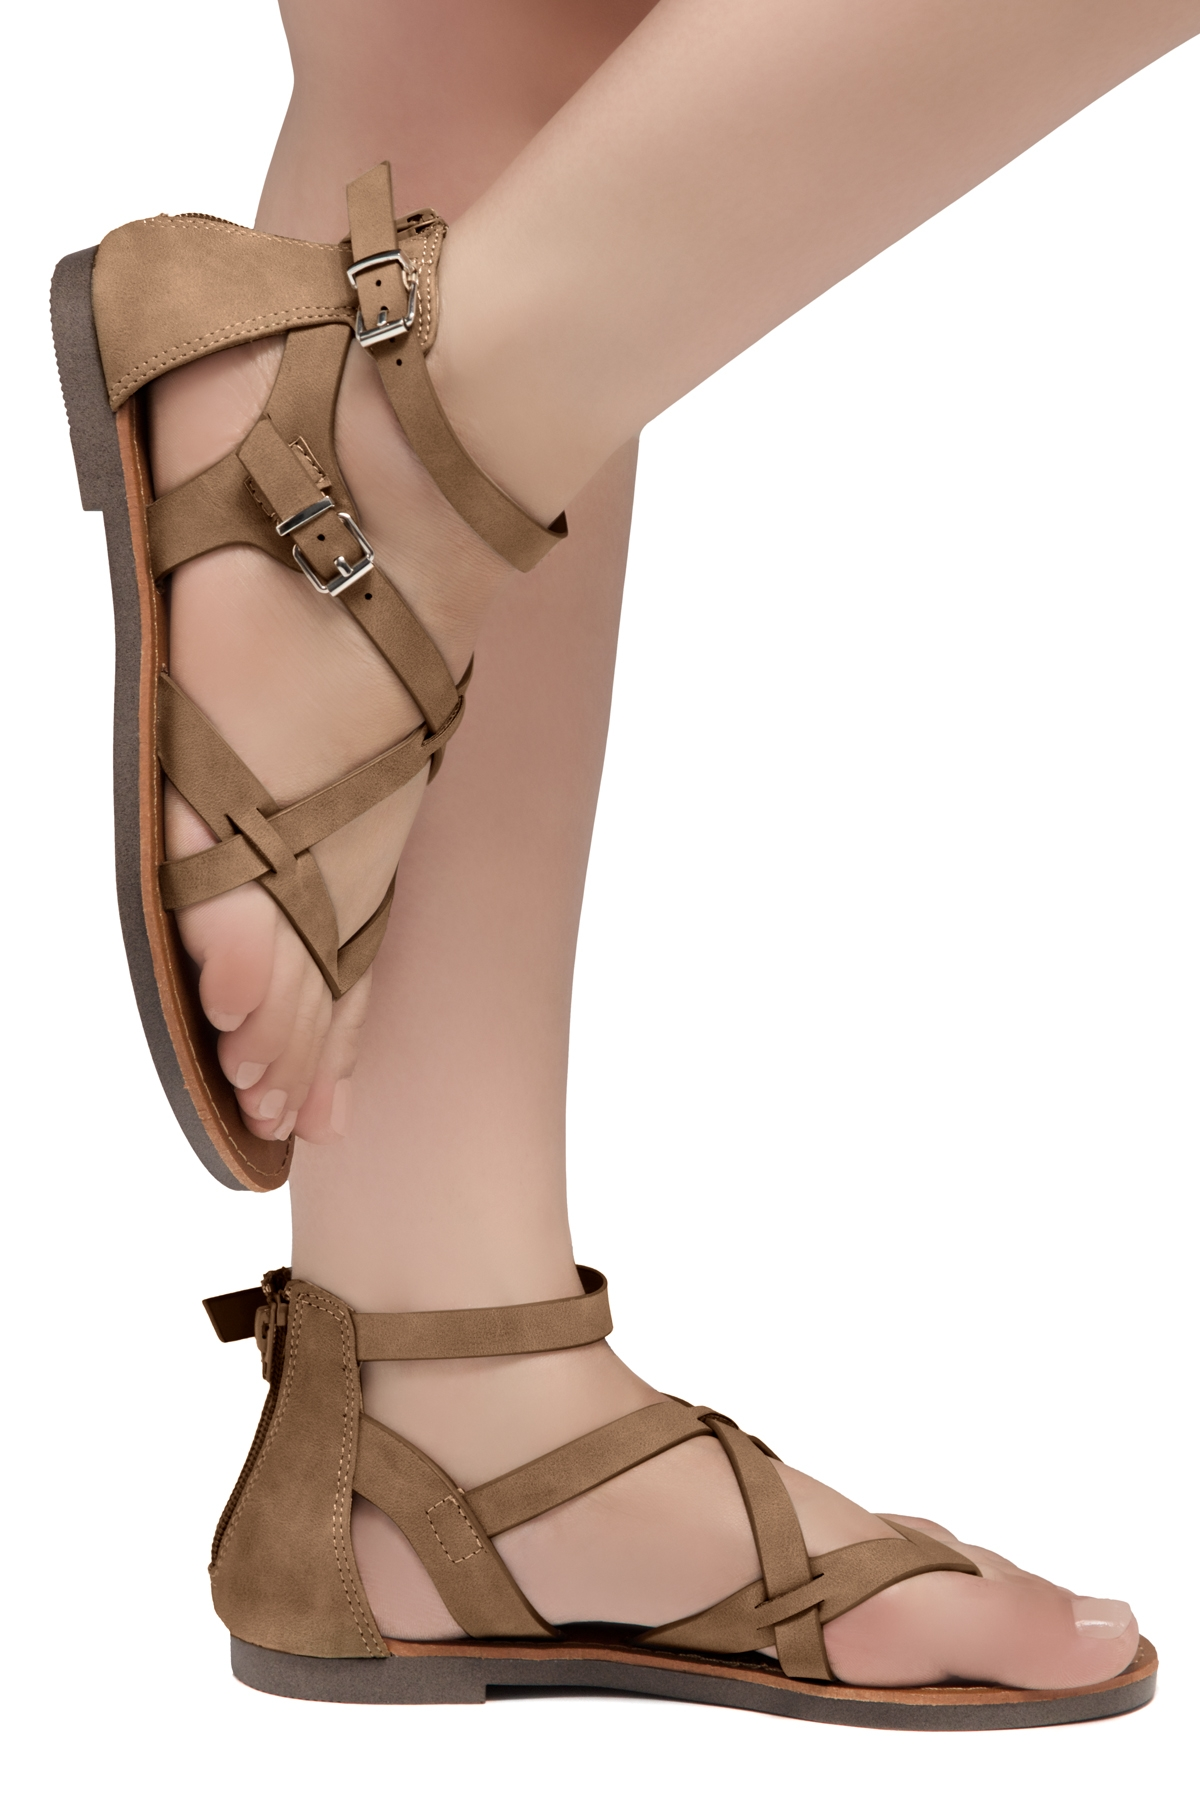 Details about  /LMK112 T-Strap Thong Toe Gladiator Flats Sandals Women Shoes Beige 7